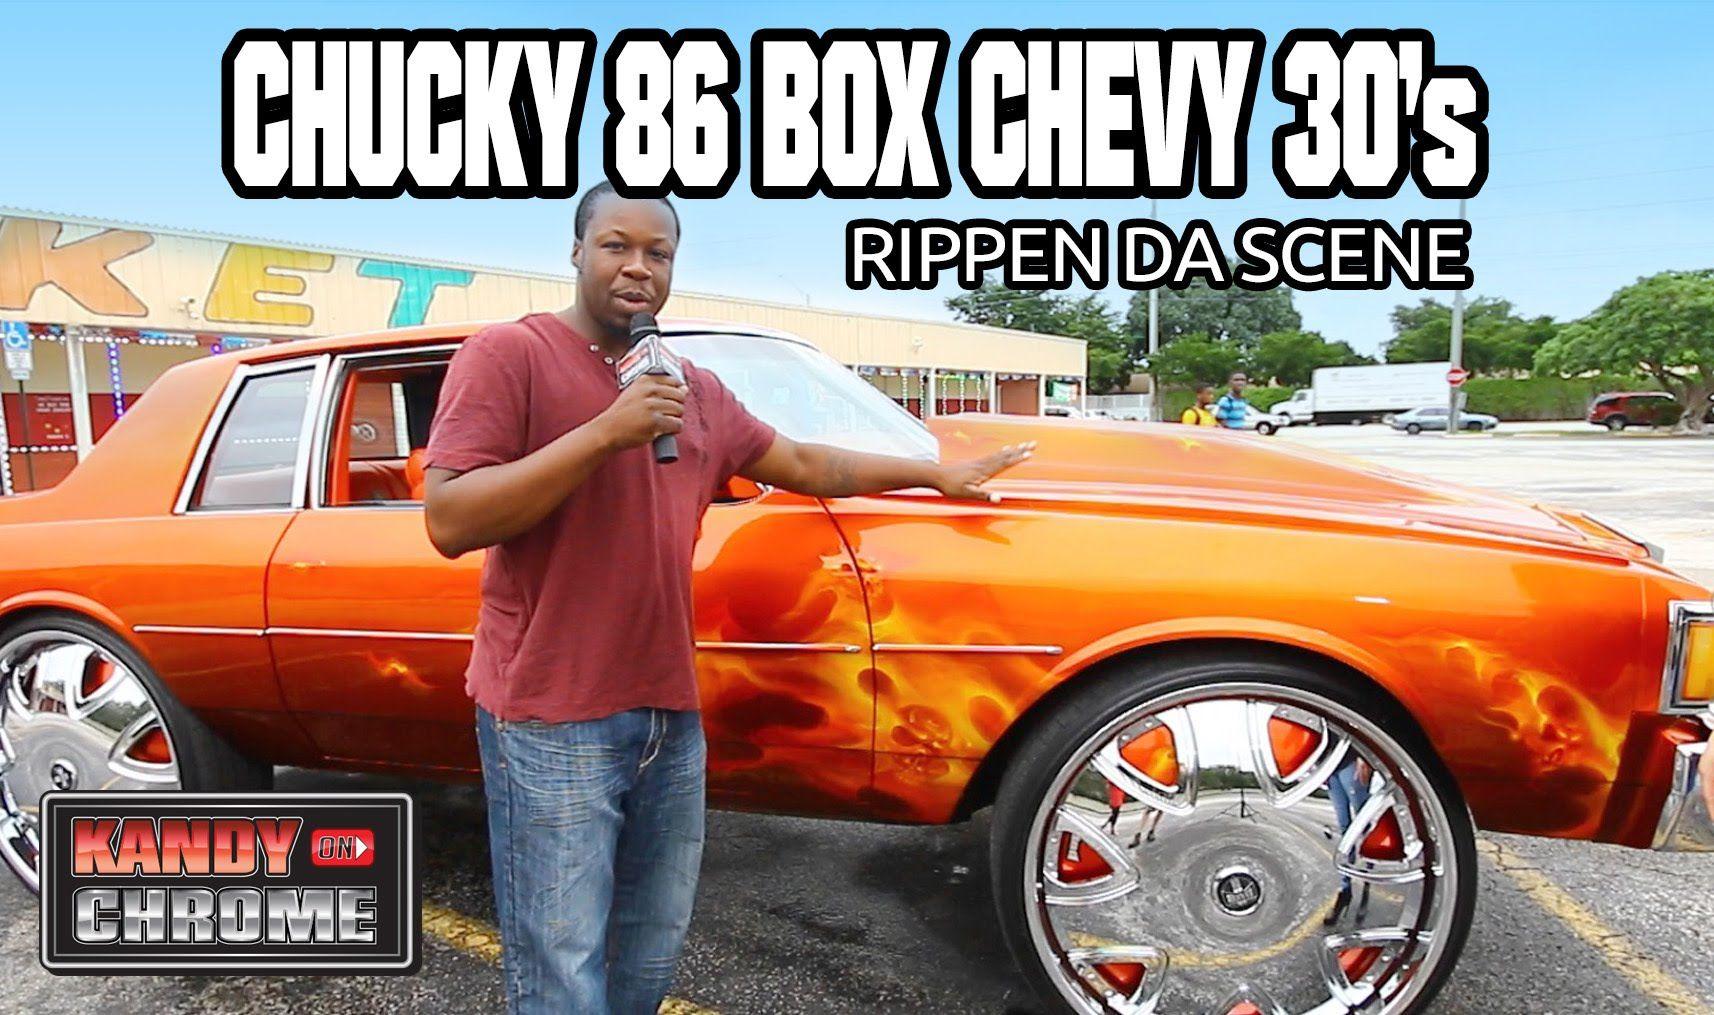 1986 box chevy on 30 s chucky [ 1714 x 1015 Pixel ]